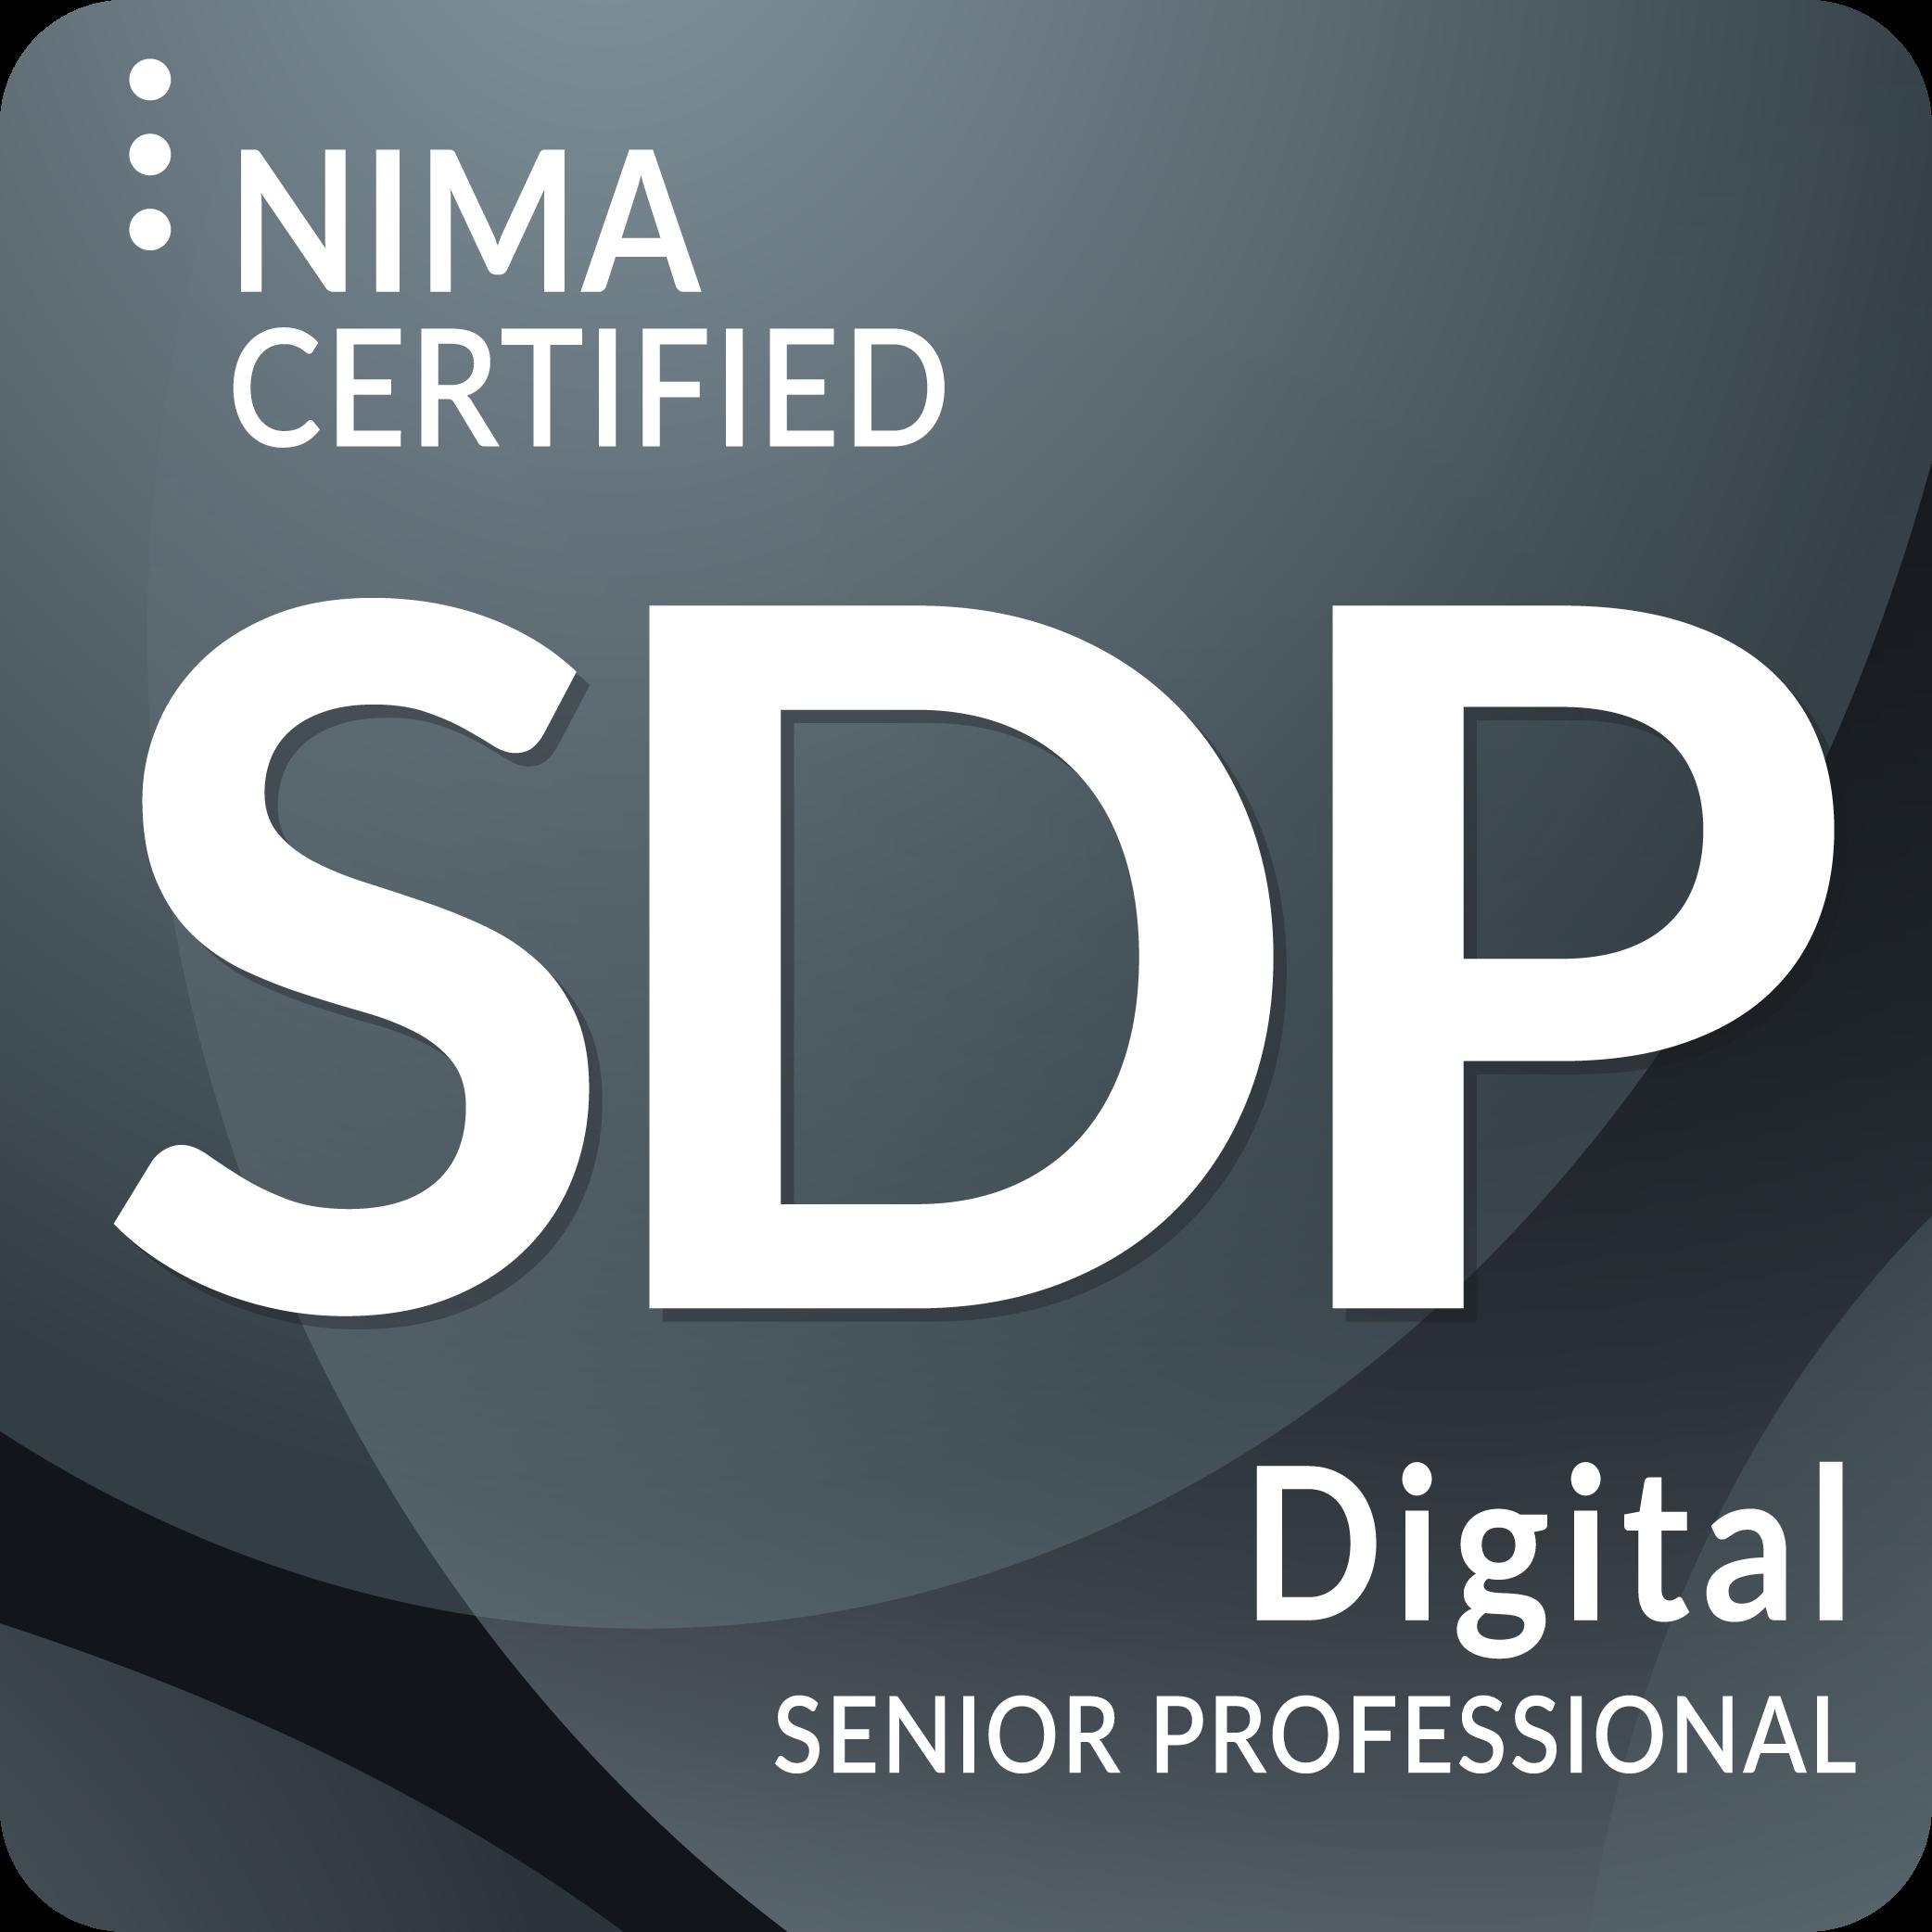 Senior Digital Professional - NIMA - Jessica Henneman